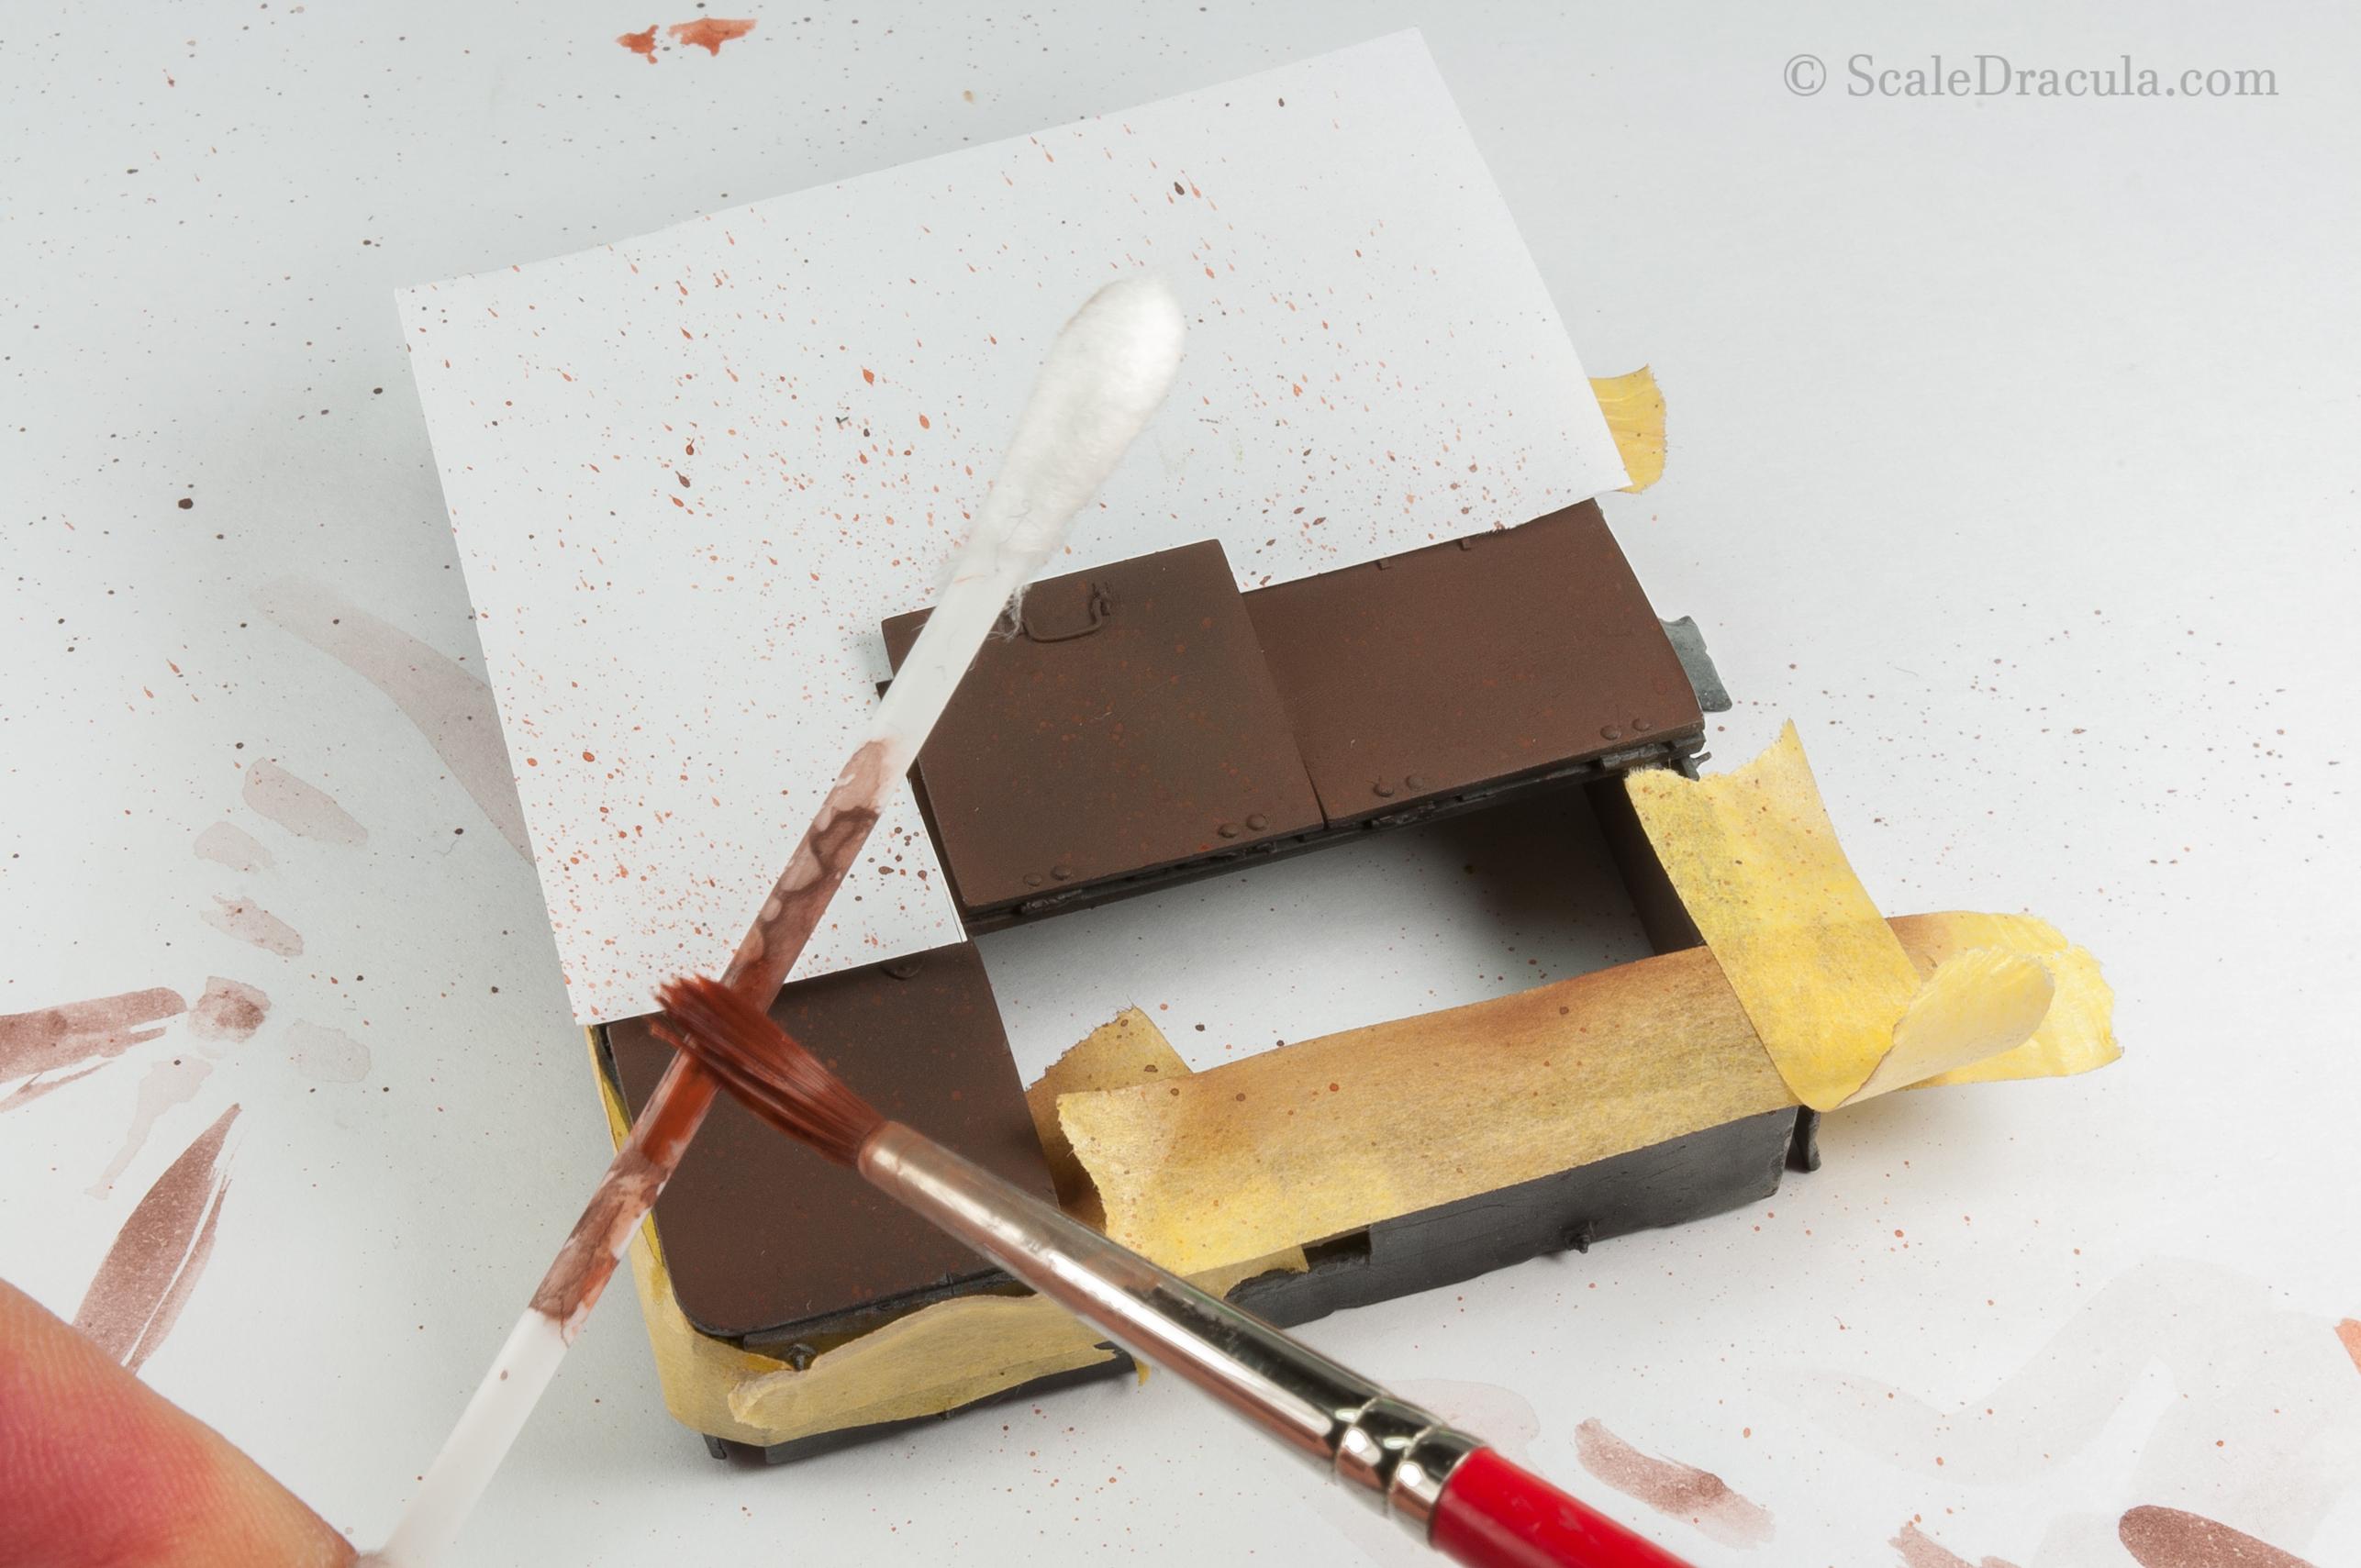 Speckling technique on rust, ZSU-57 by TAKOM